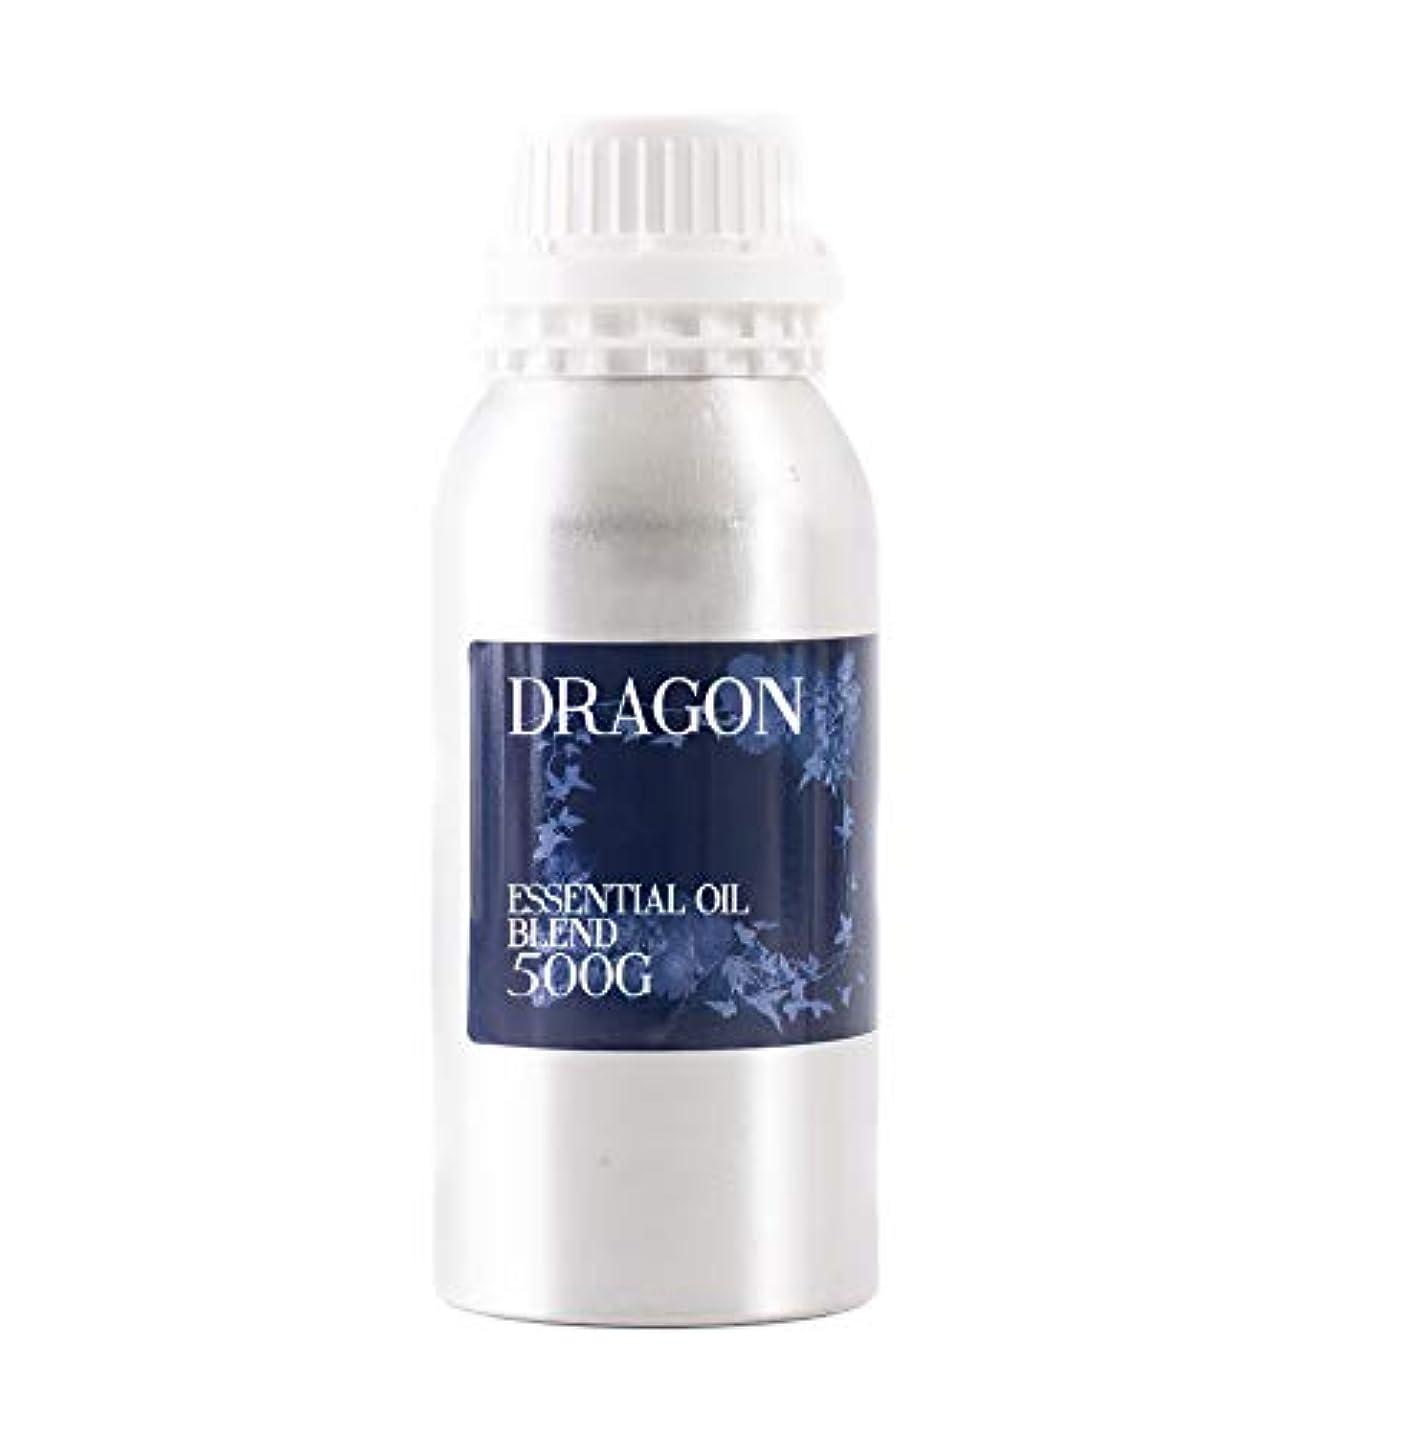 ピンク社交的批判的Mystix London   Dragon   Chinese Zodiac Essential Oil Blend 500g